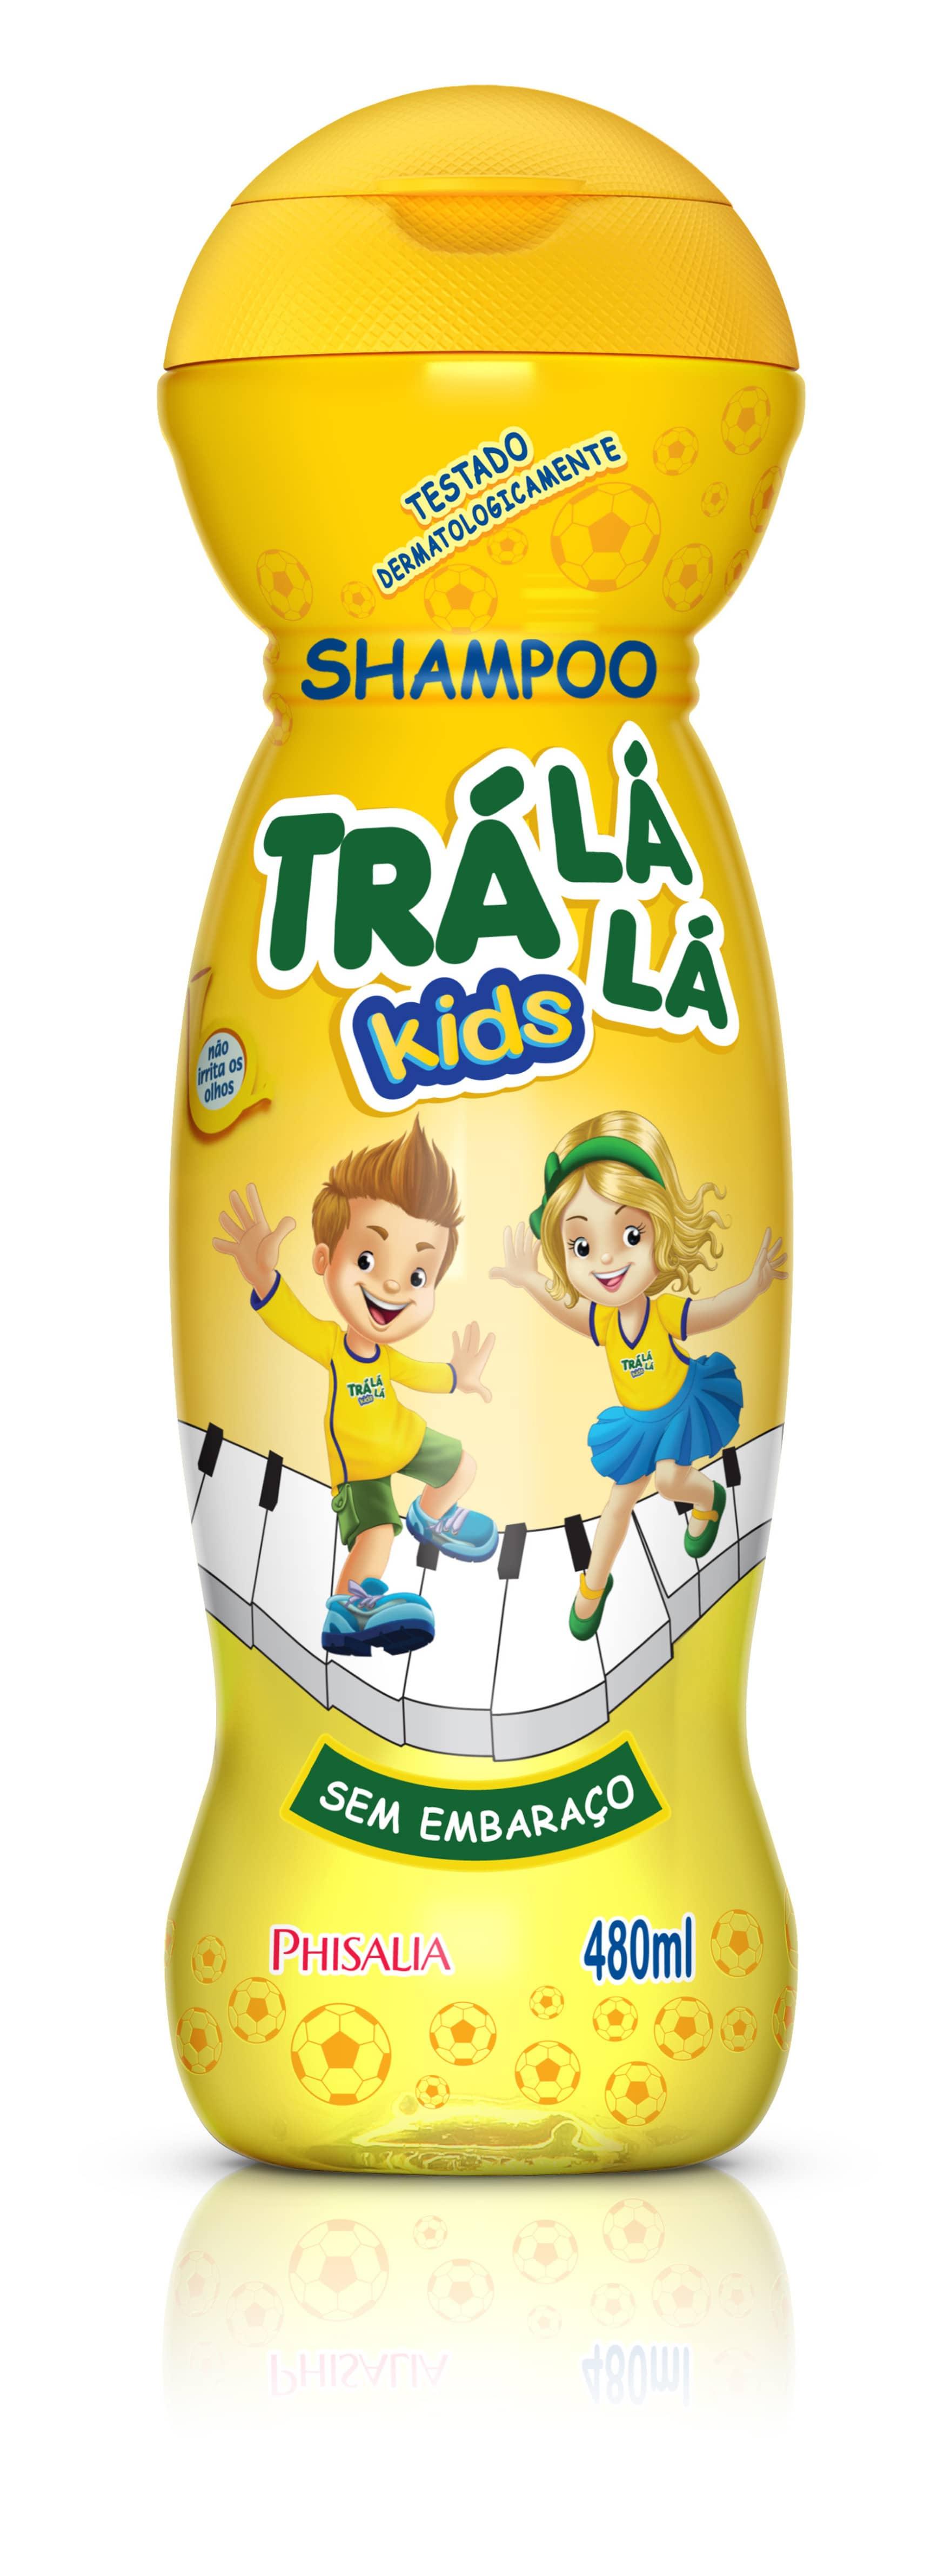 TRALALA-EDICAO-COPA-1